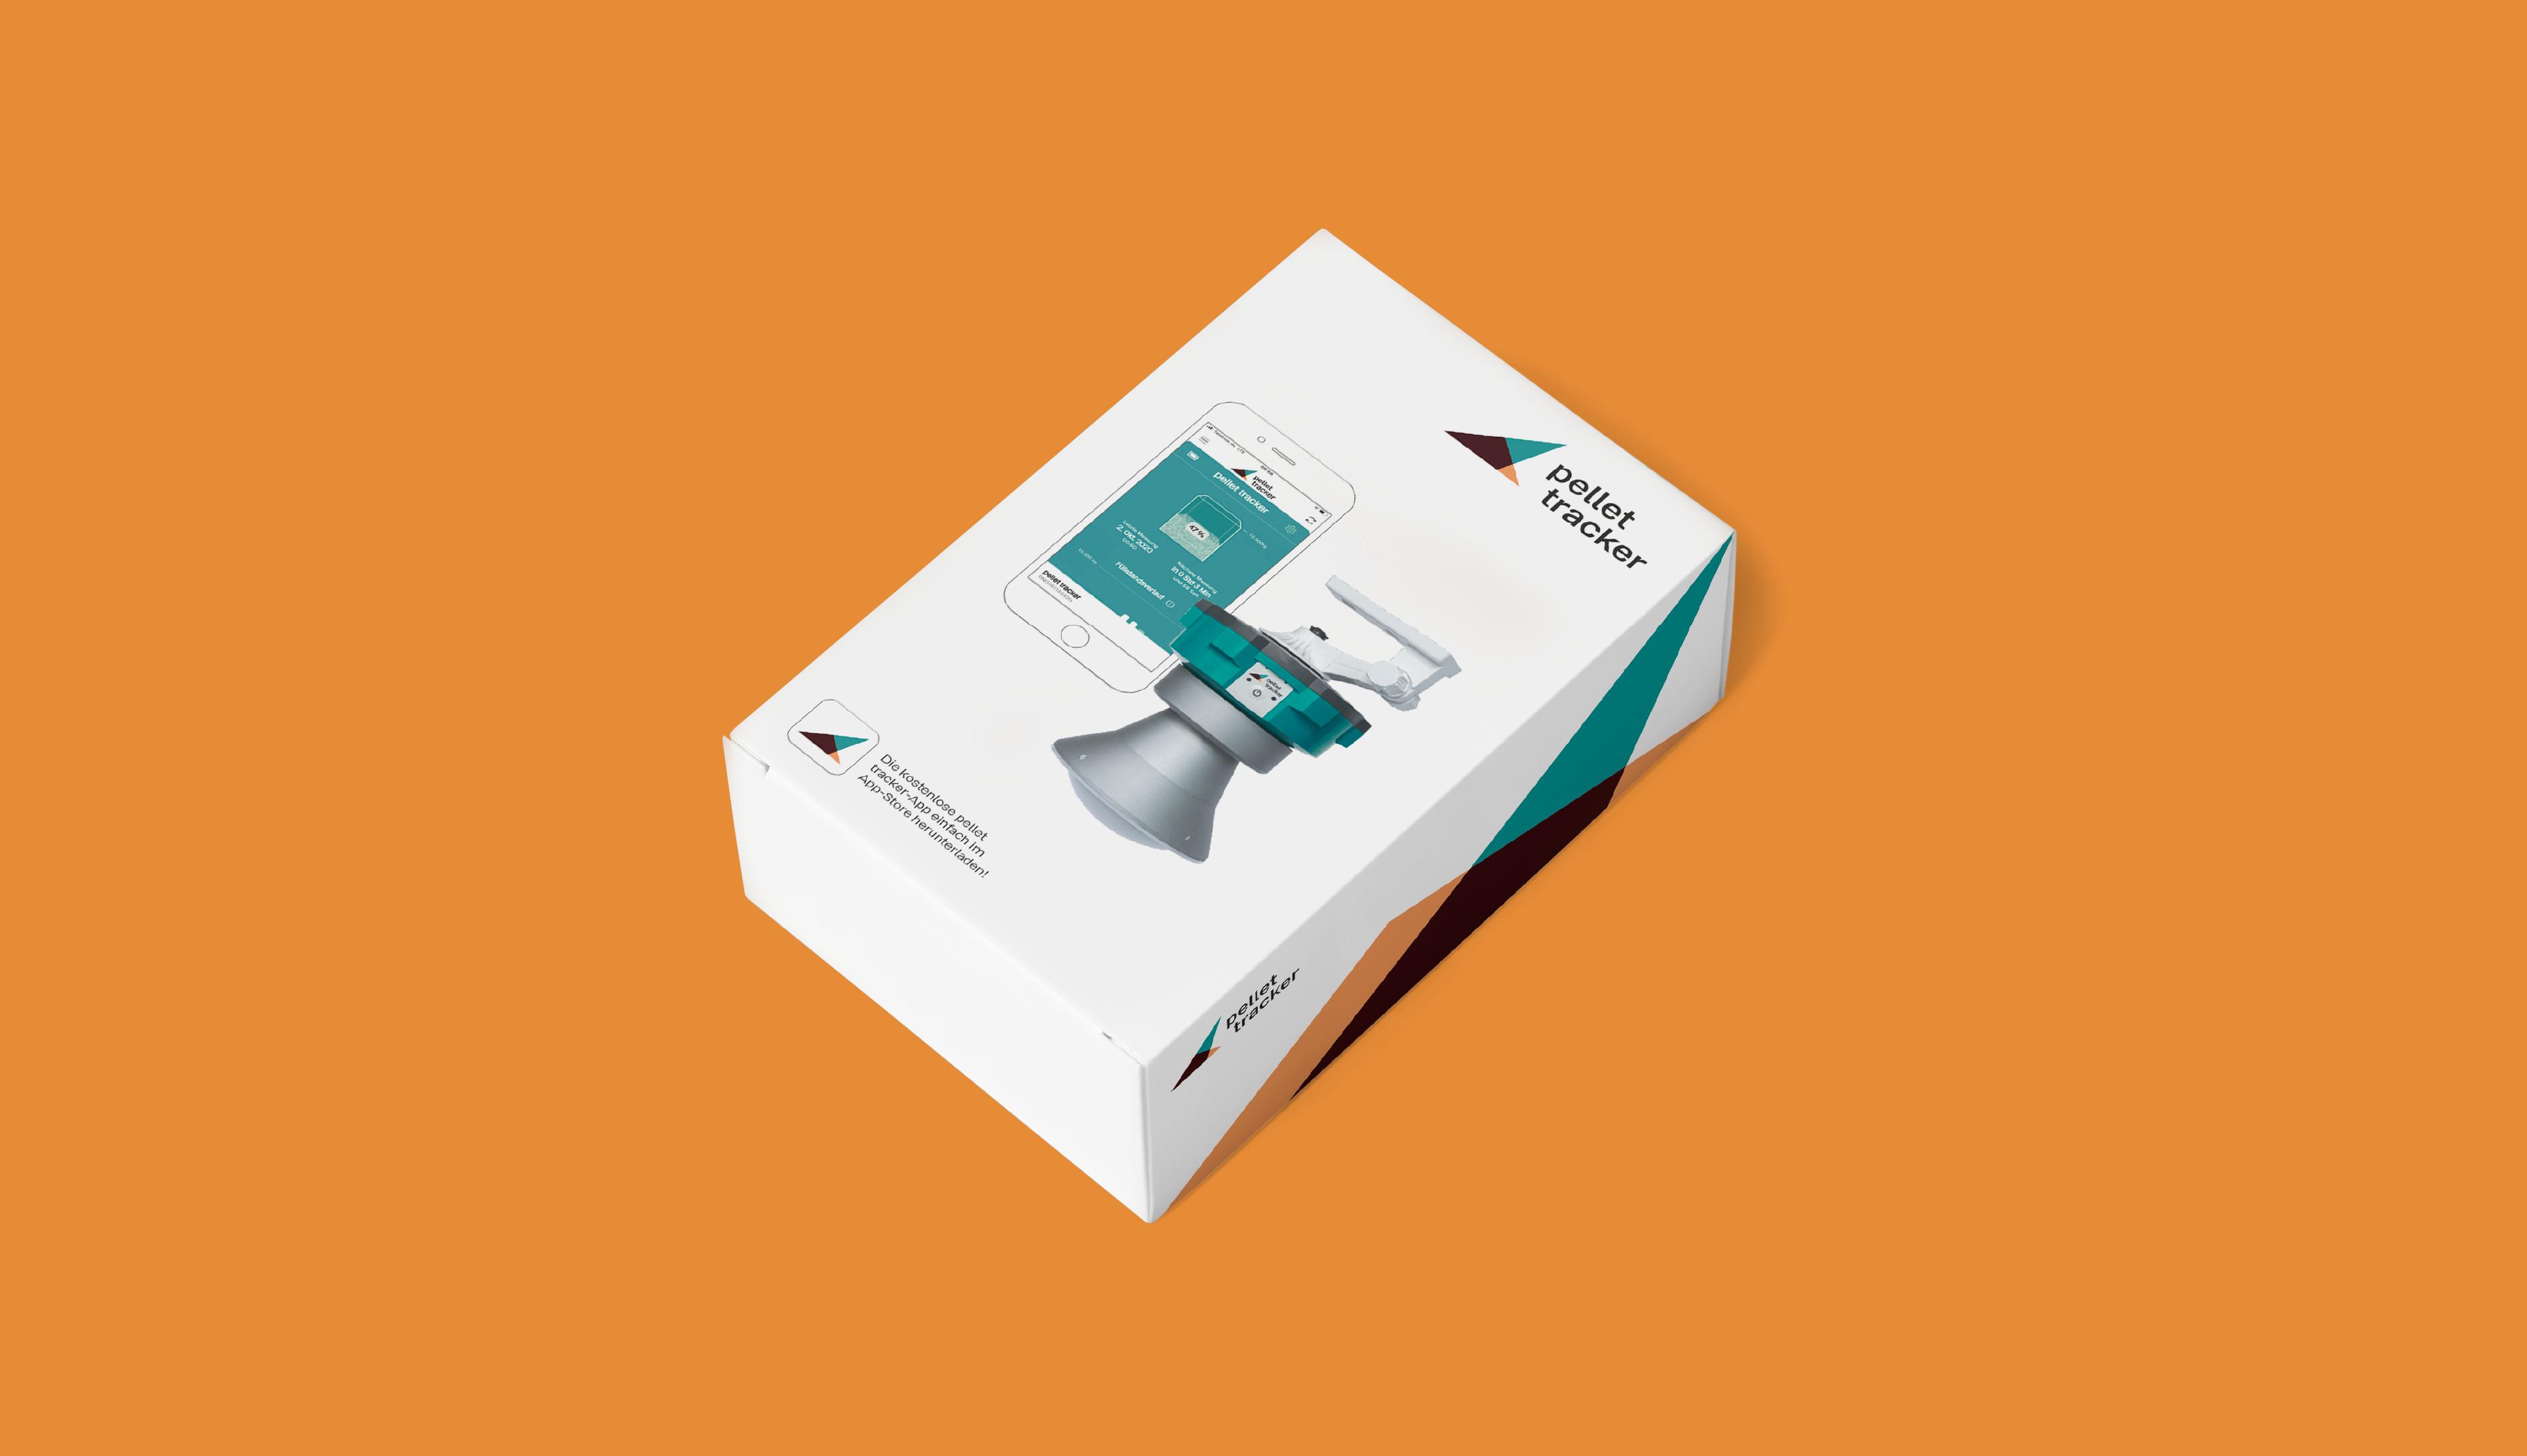 pellet-tracker-mietgeraet-produkt